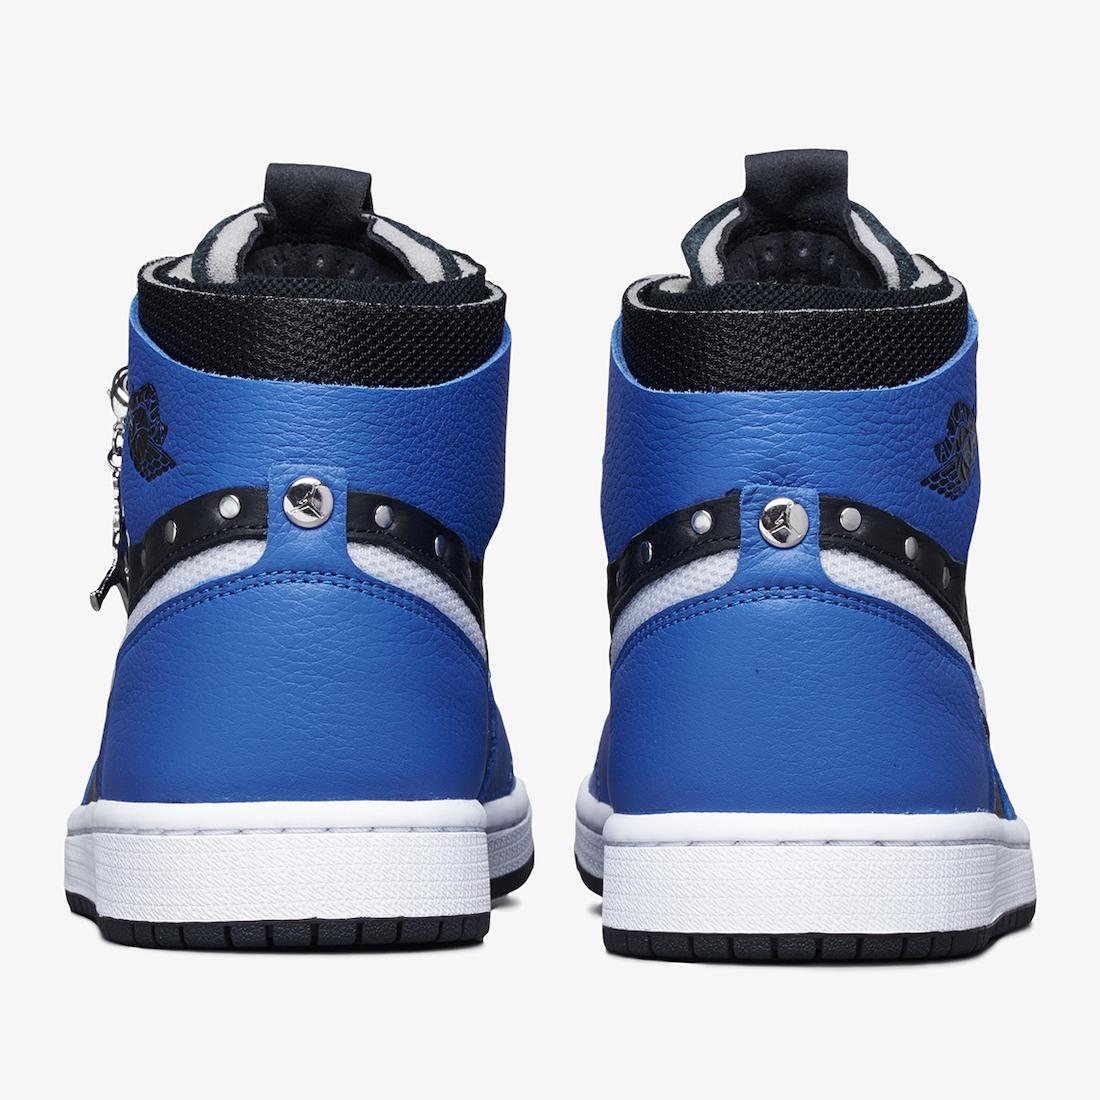 Air Jordan 1 Zoom Comfort Hyper Royal Sisterhood CZ1360-401 Release Date Info